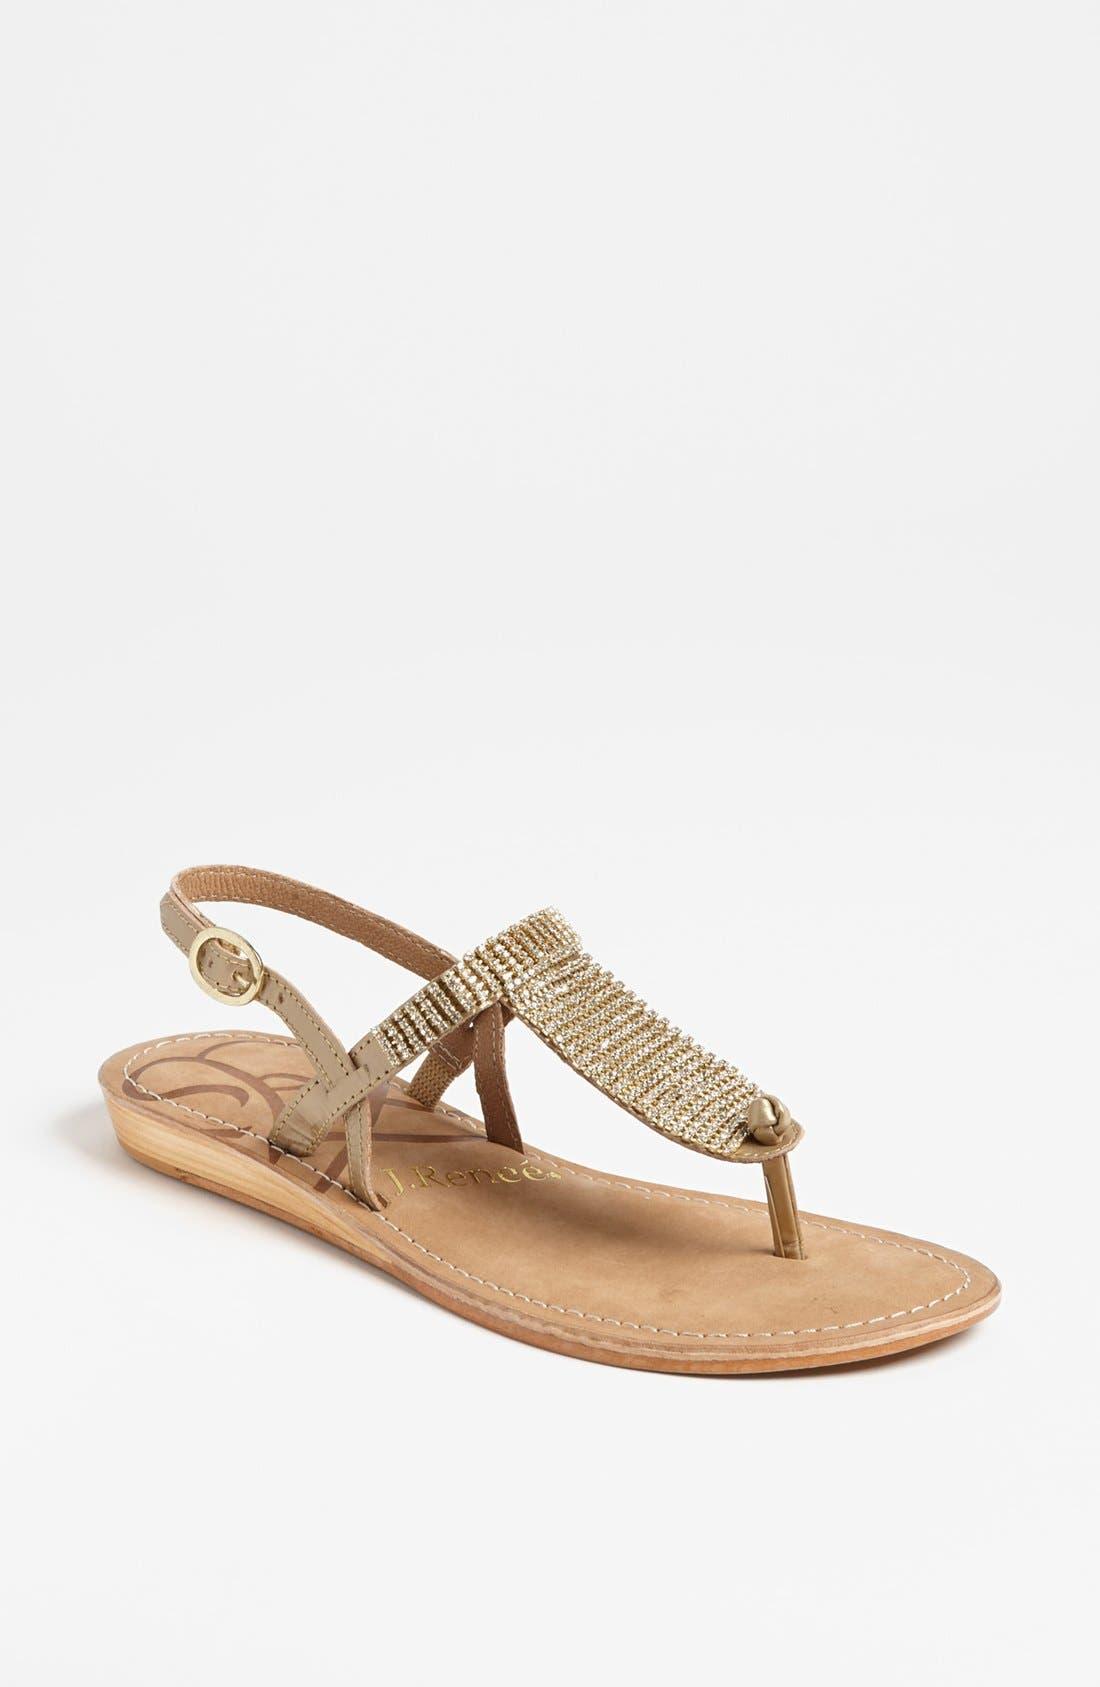 Main Image - J. Reneé 'Stella' Sandal